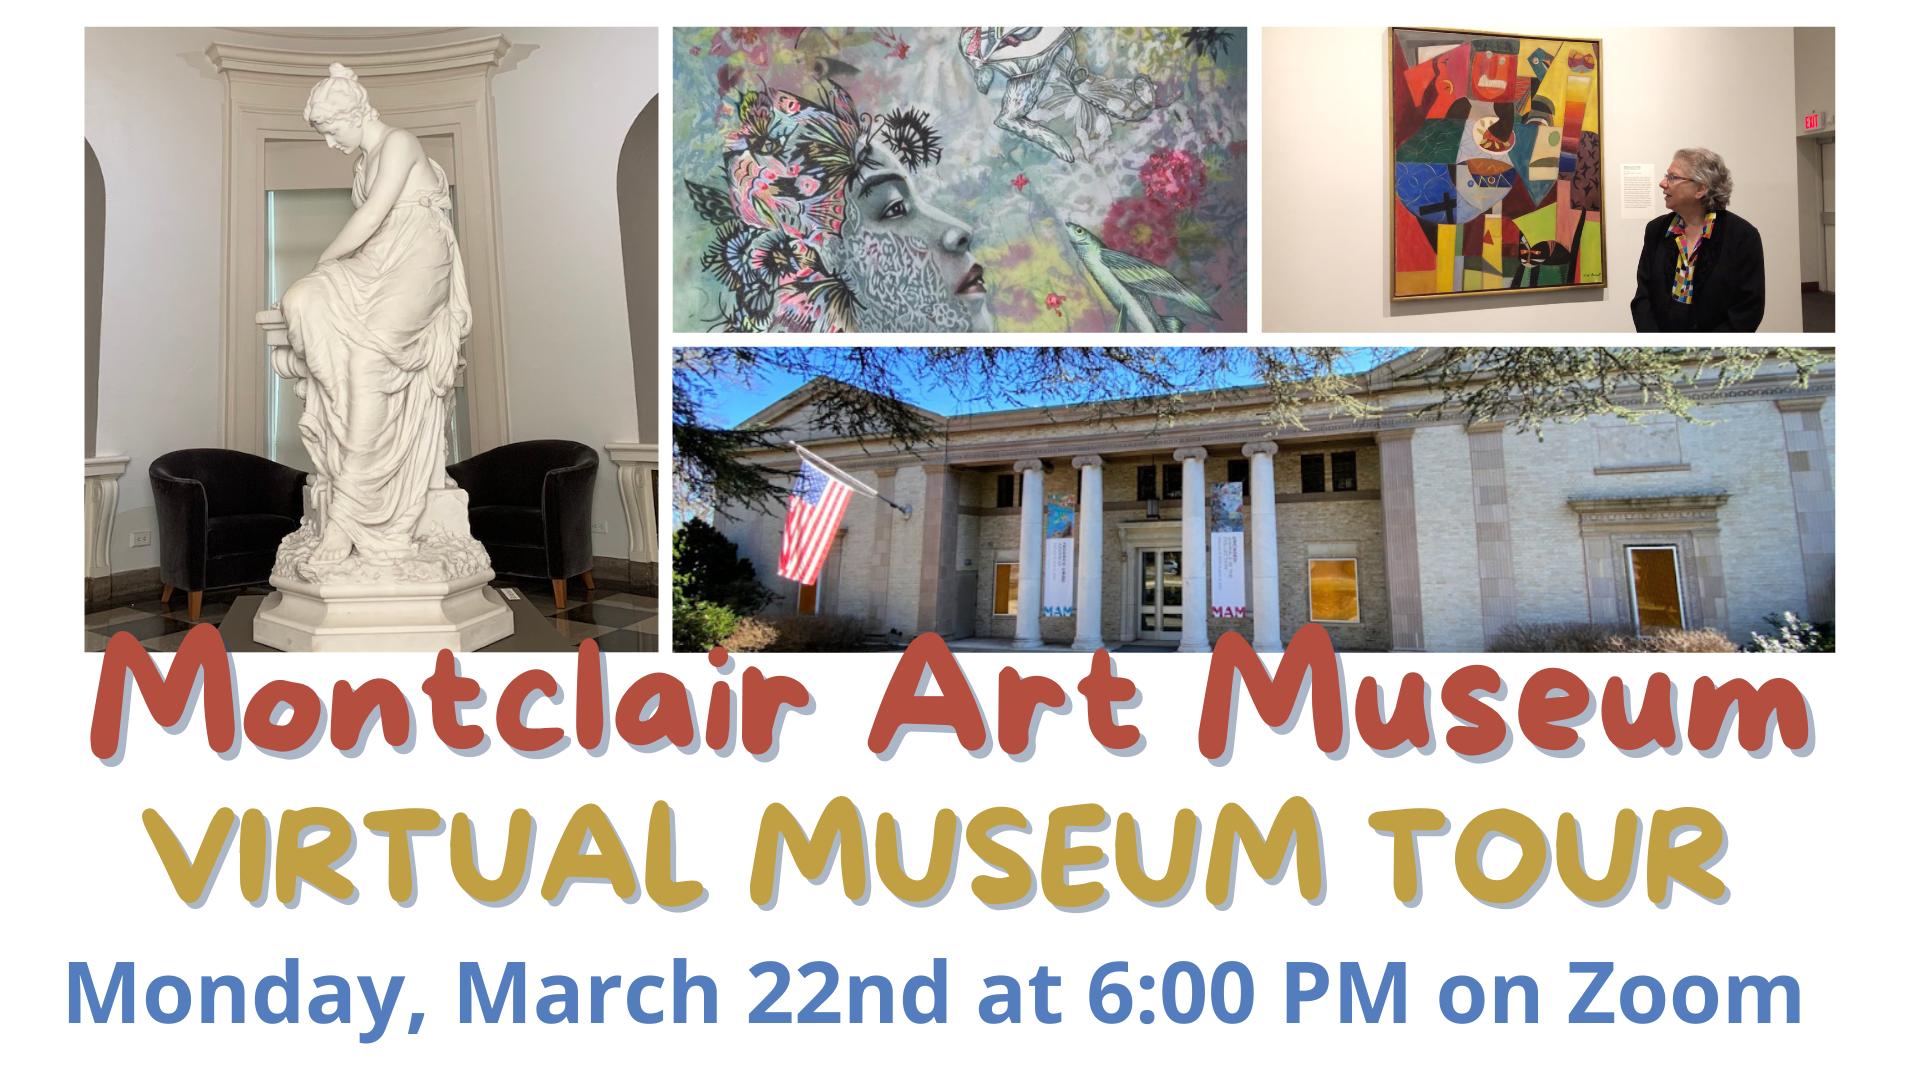 Montclair Art Museum Tour